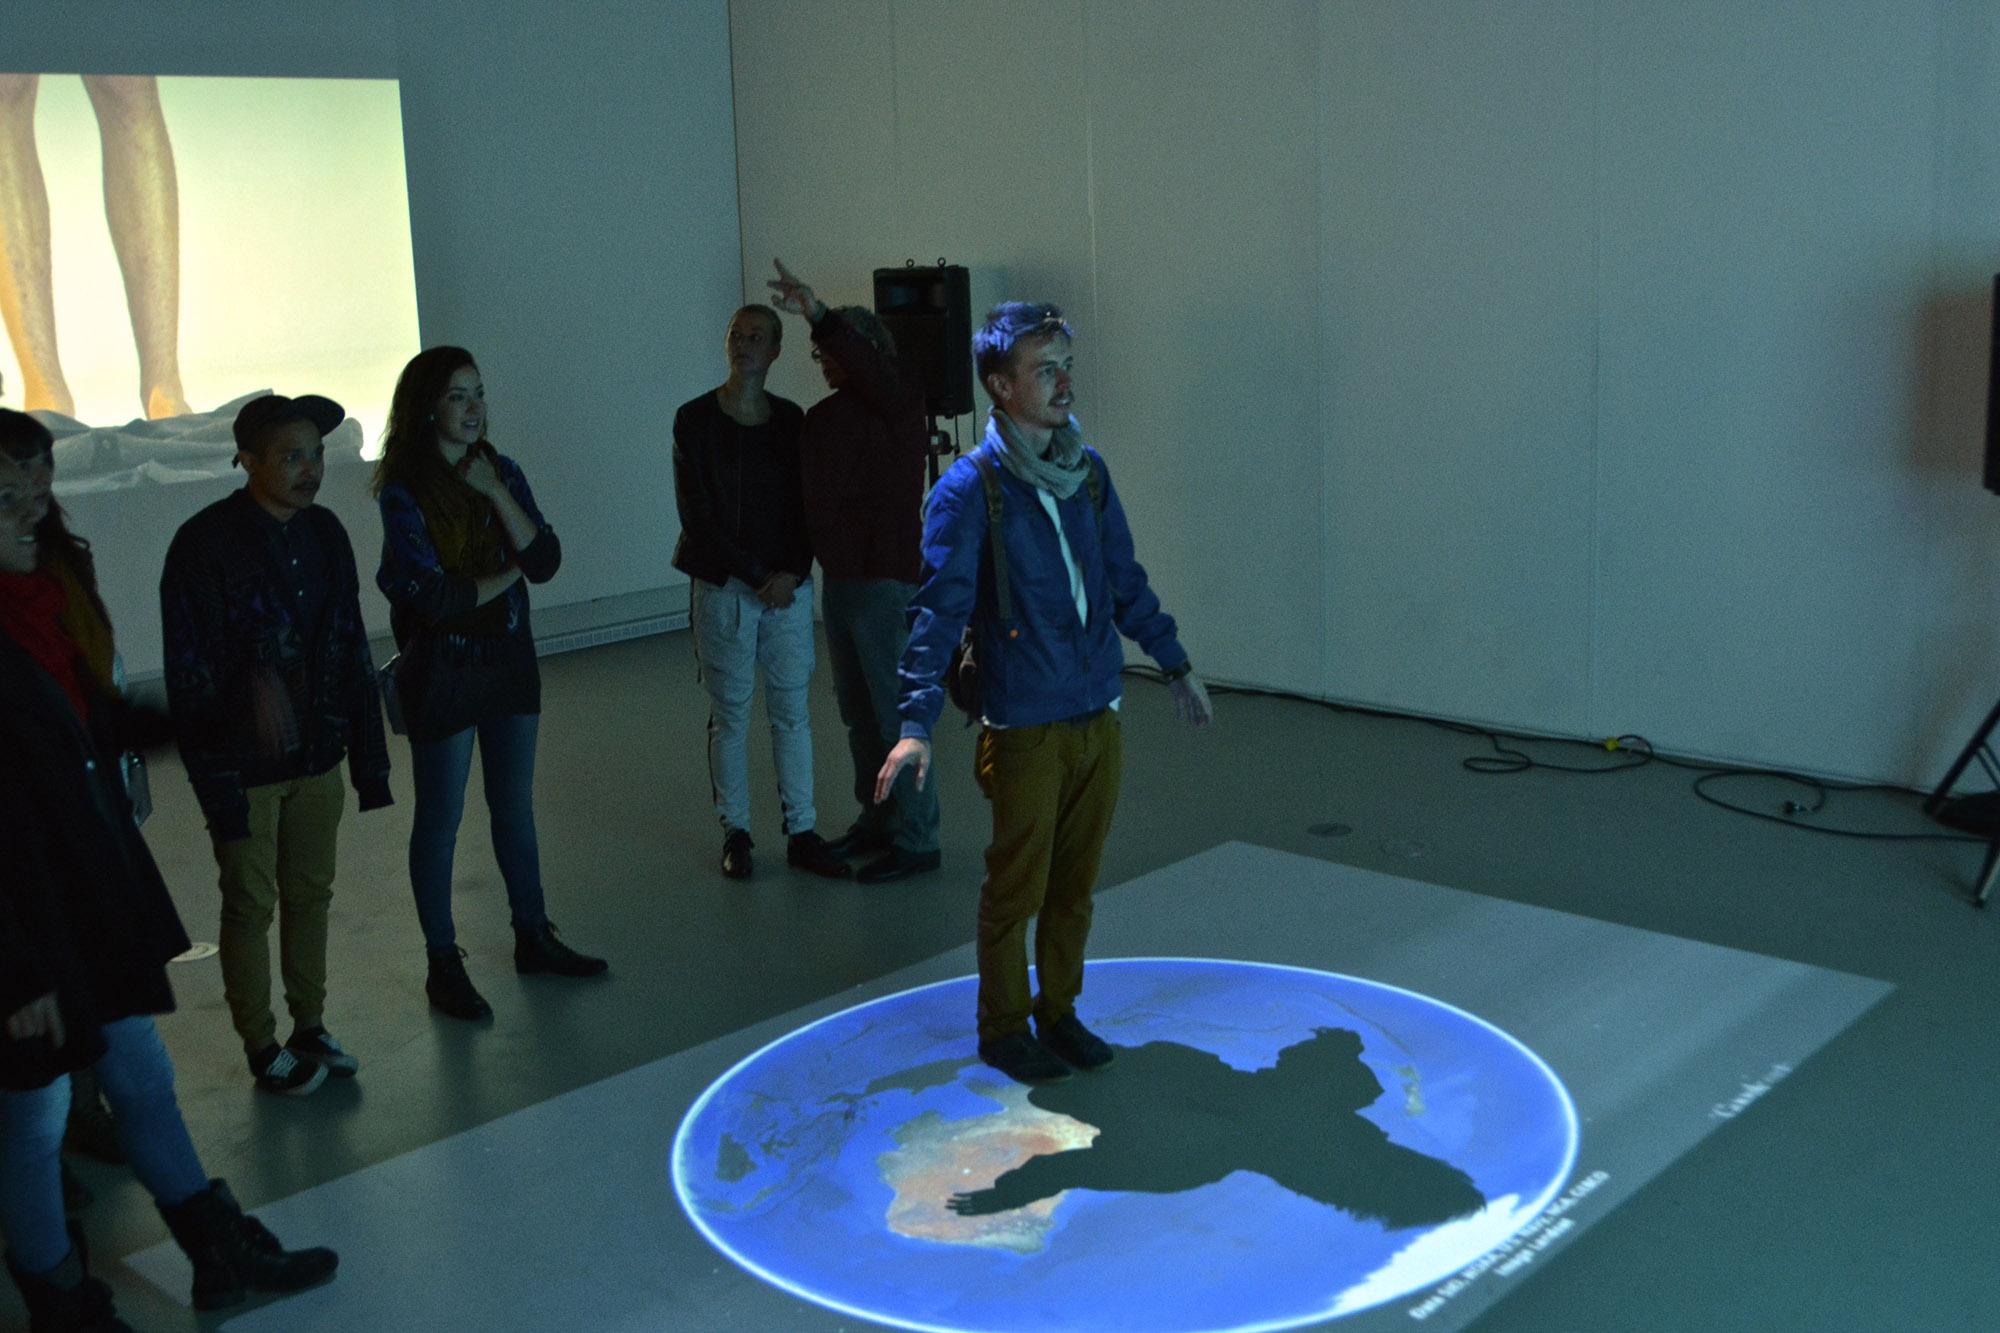 Exhibition at the Galerie R3, Trois-Rivières, Qc. 2015  (In collaboration with Emmanuelle Hoarau and Sébastien Cossette)